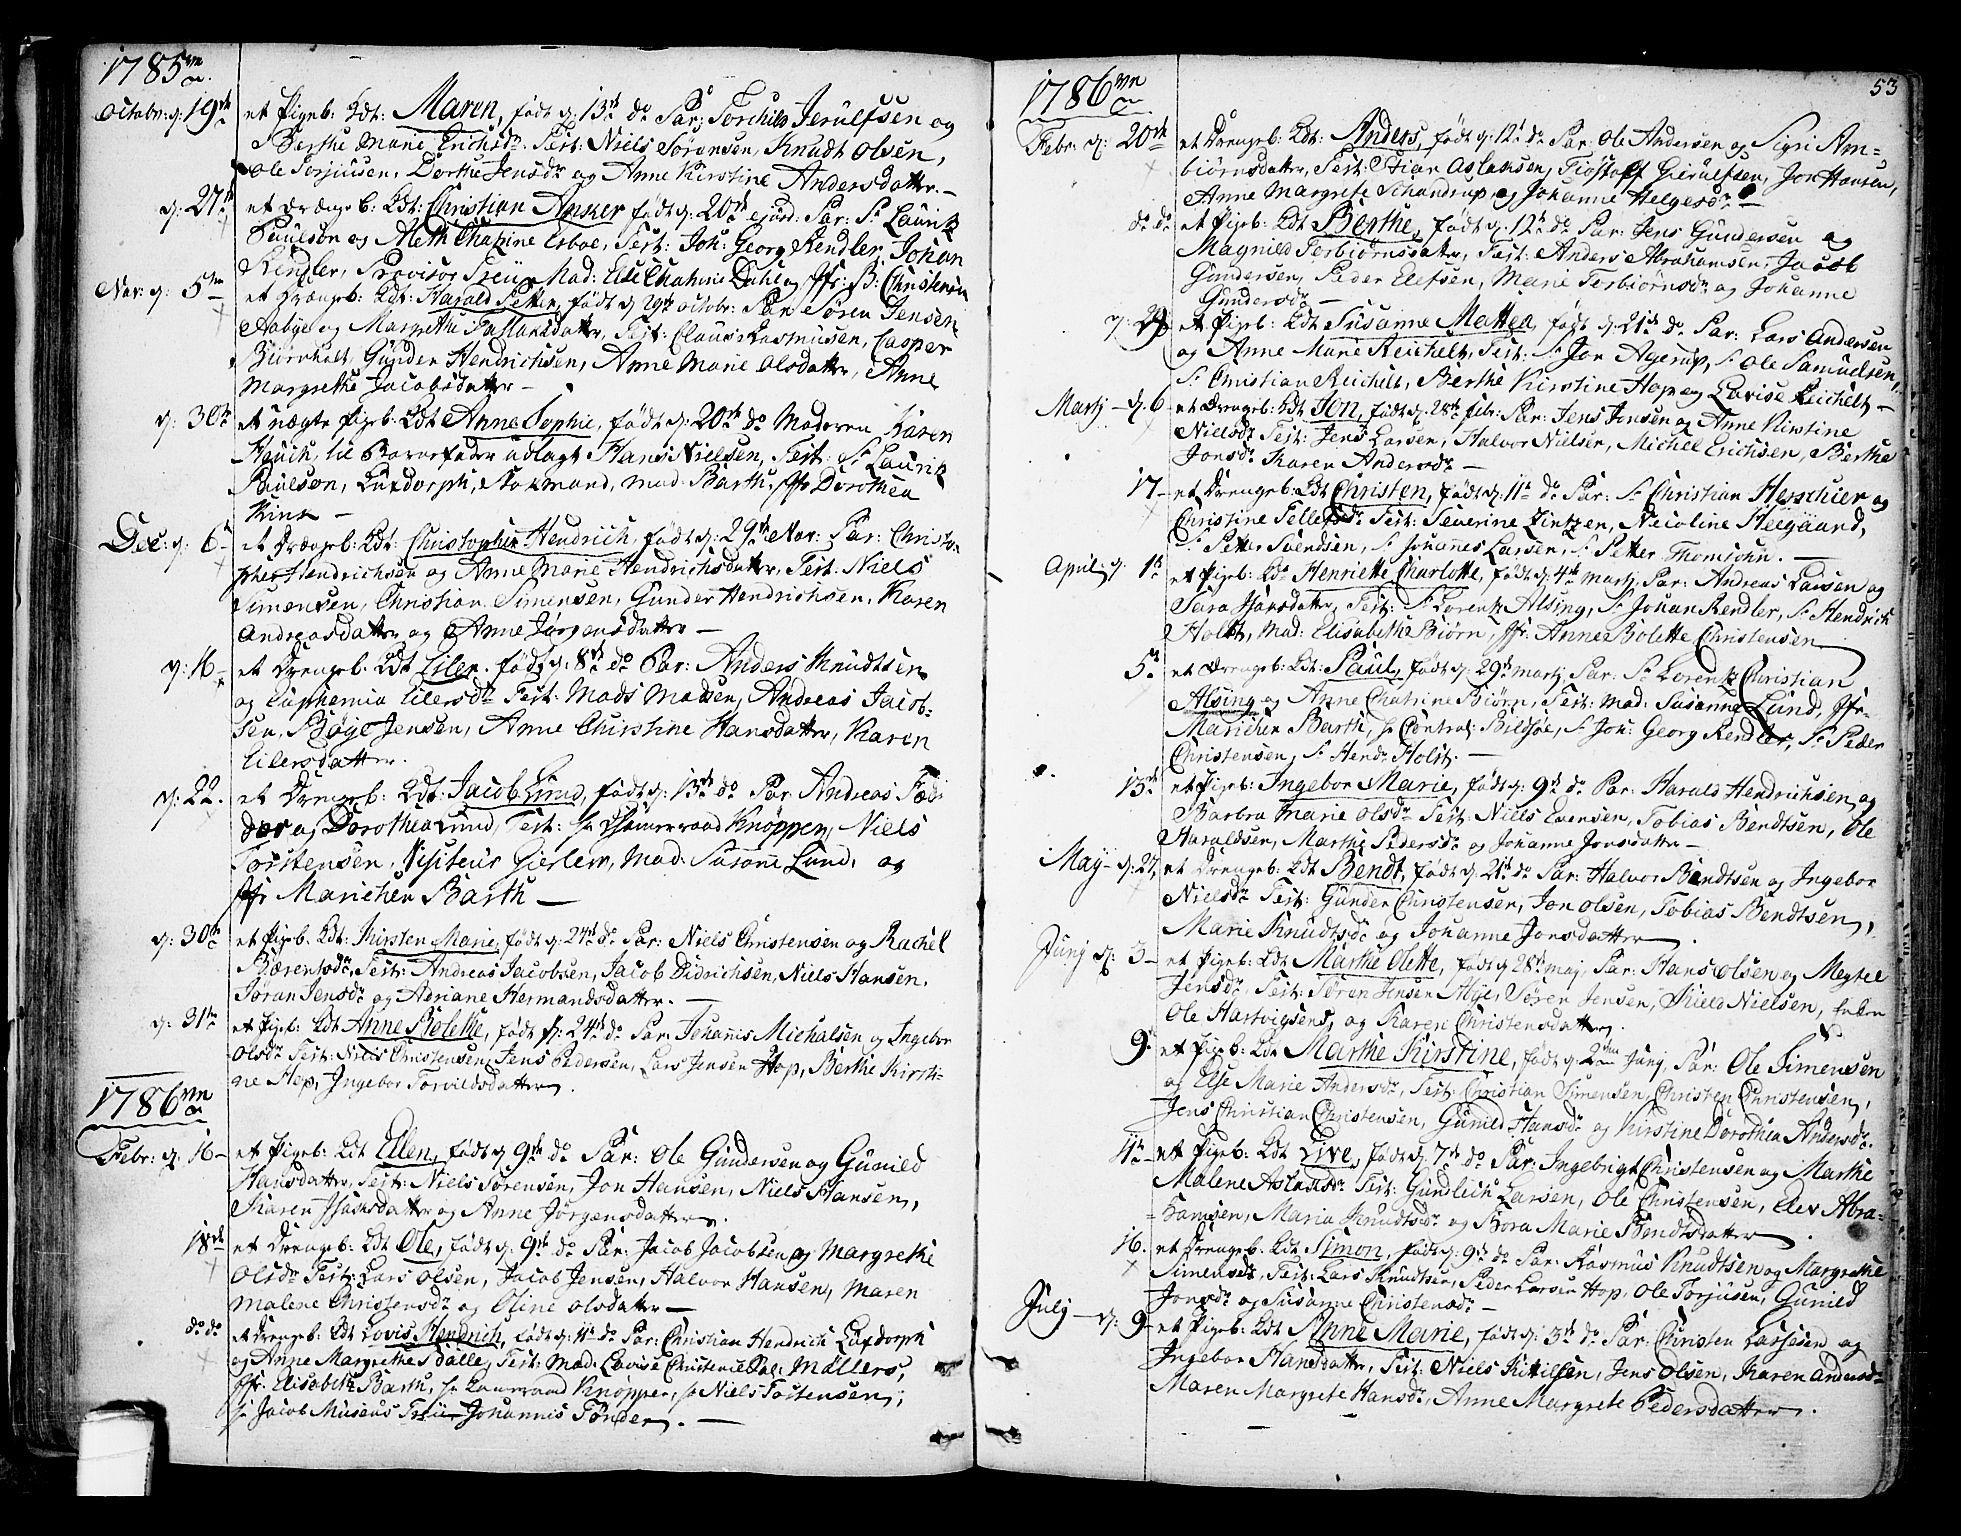 SAKO, Kragerø kirkebøker, F/Fa/L0002: Ministerialbok nr. 2, 1767-1802, s. 53